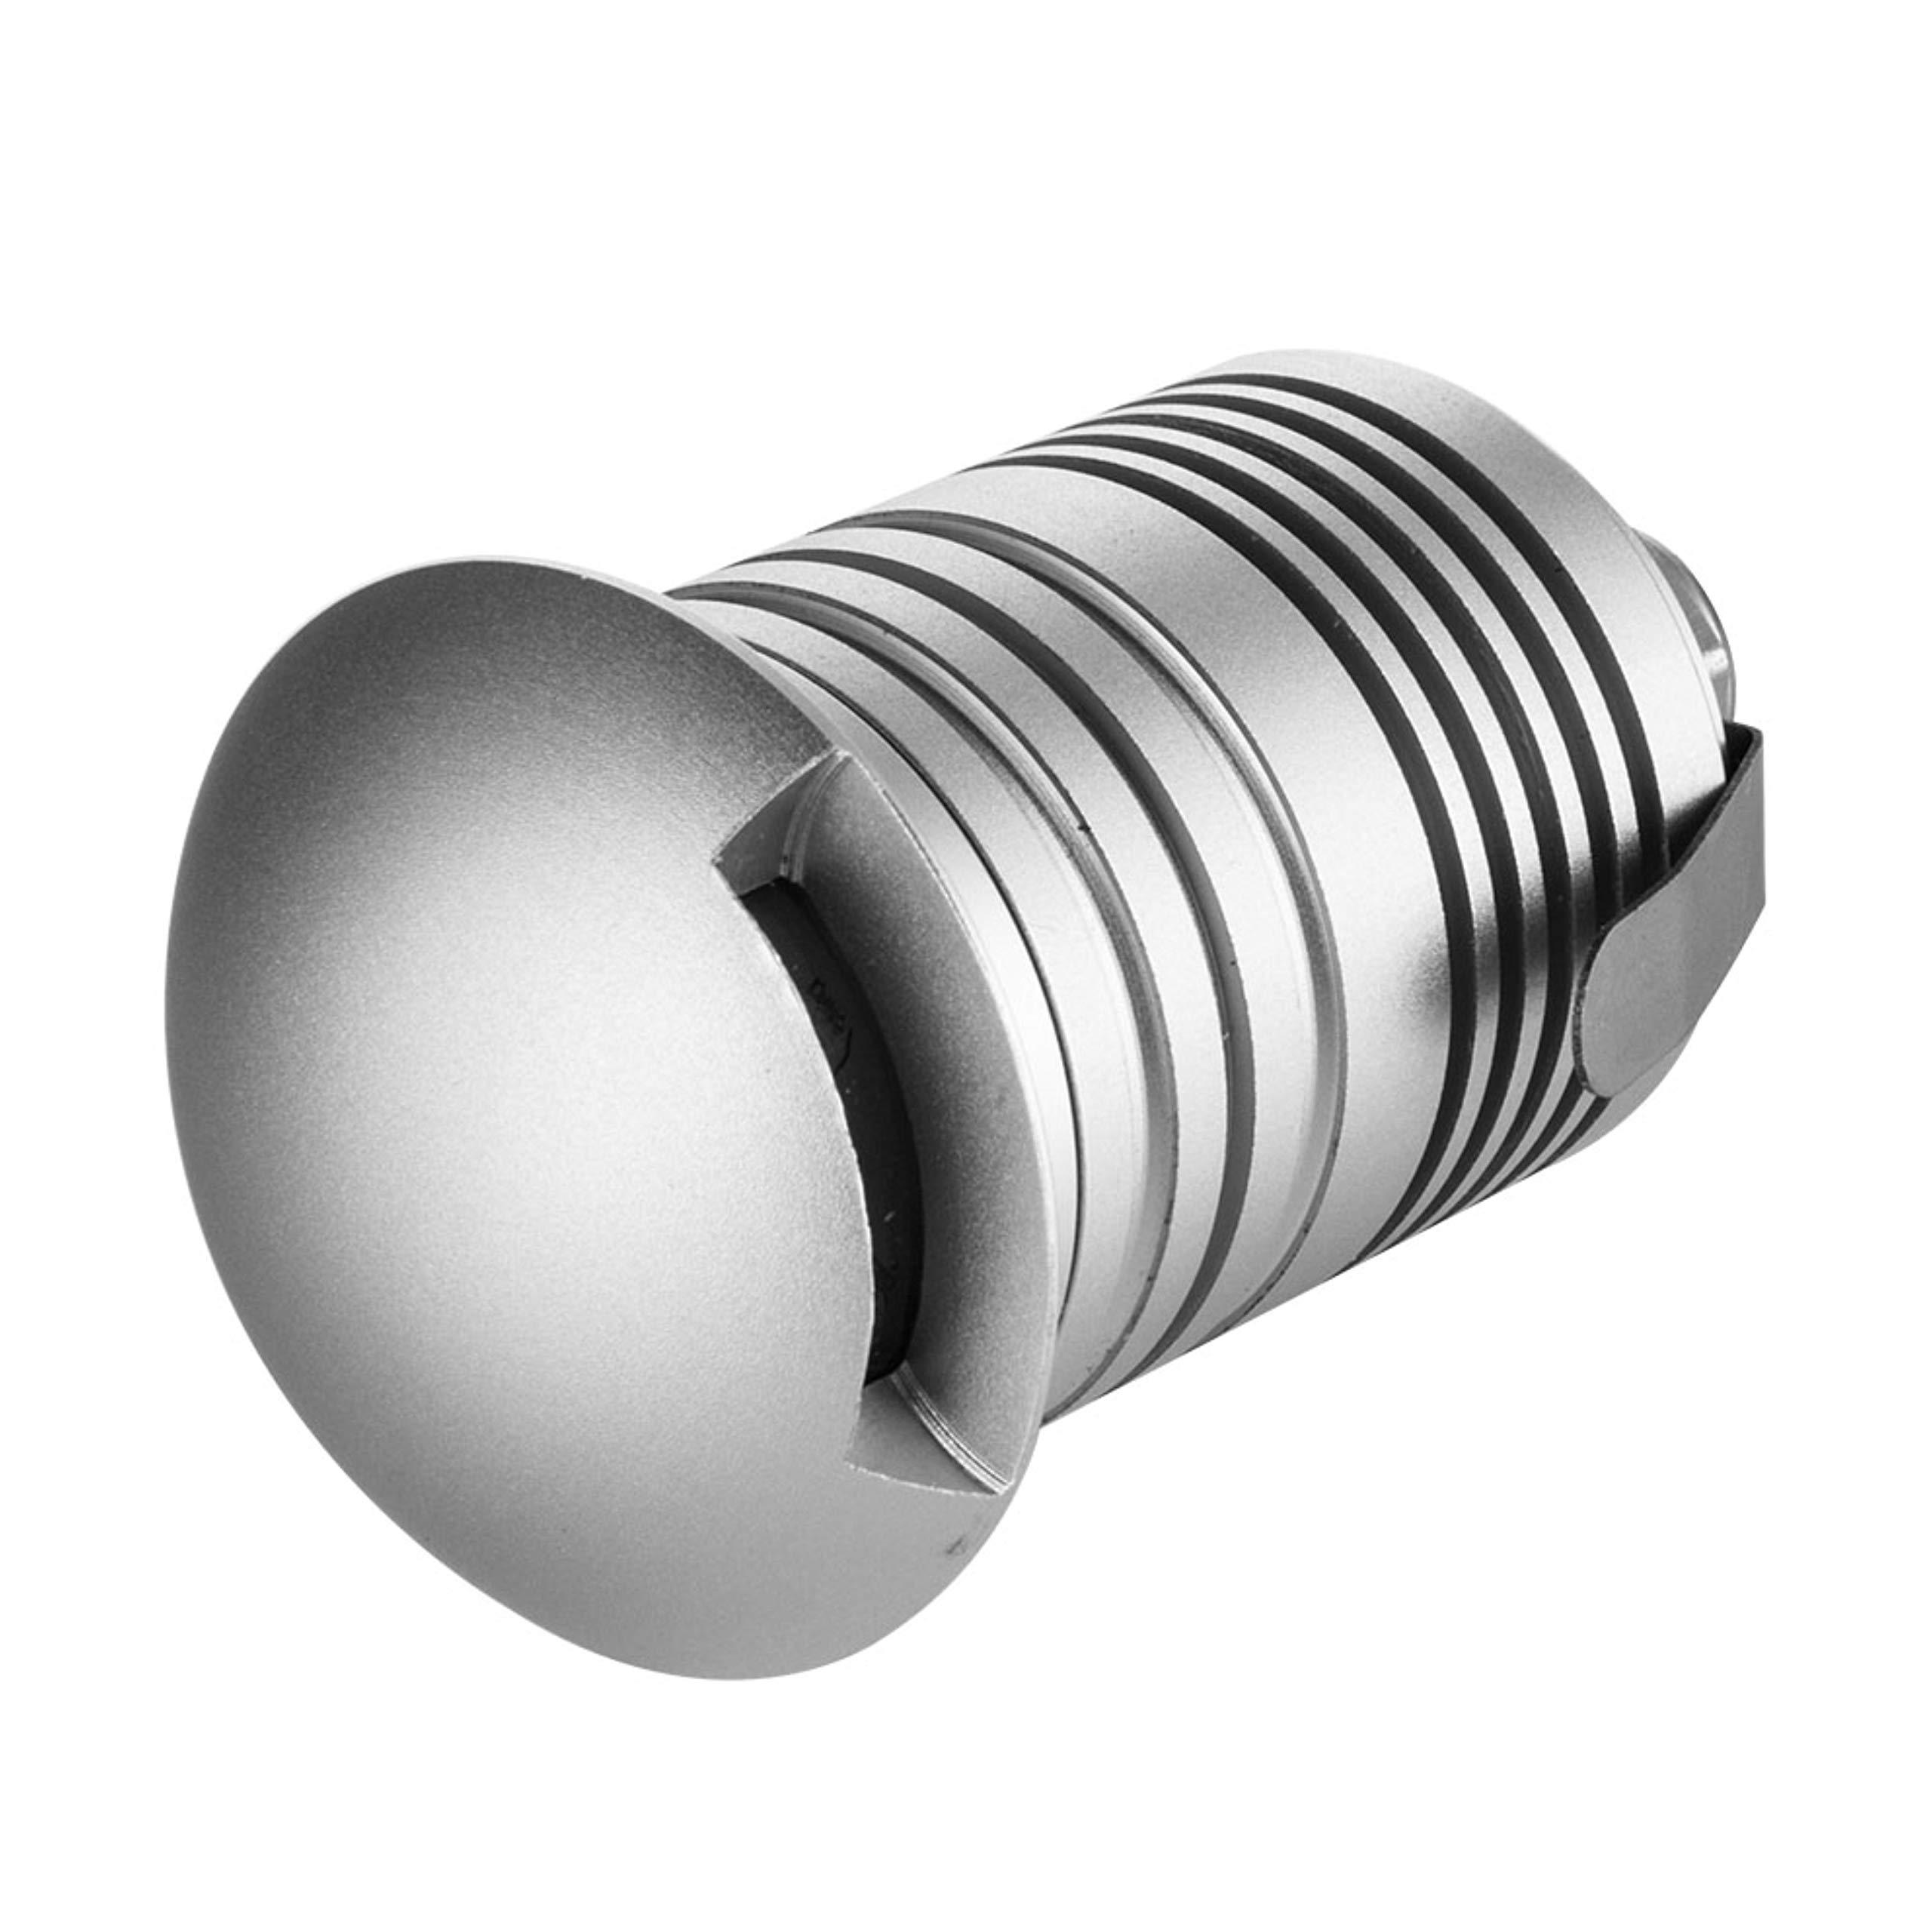 E-Simpo 10pcs 3W Waterproof LED Underground Lamp,led driveway lights, Side Emitting, LED Floor Light, LED Path Light, LED Stairs Light IP67 DC12-24V 280LM,with Embeded Holder. (Q3-Warm White)